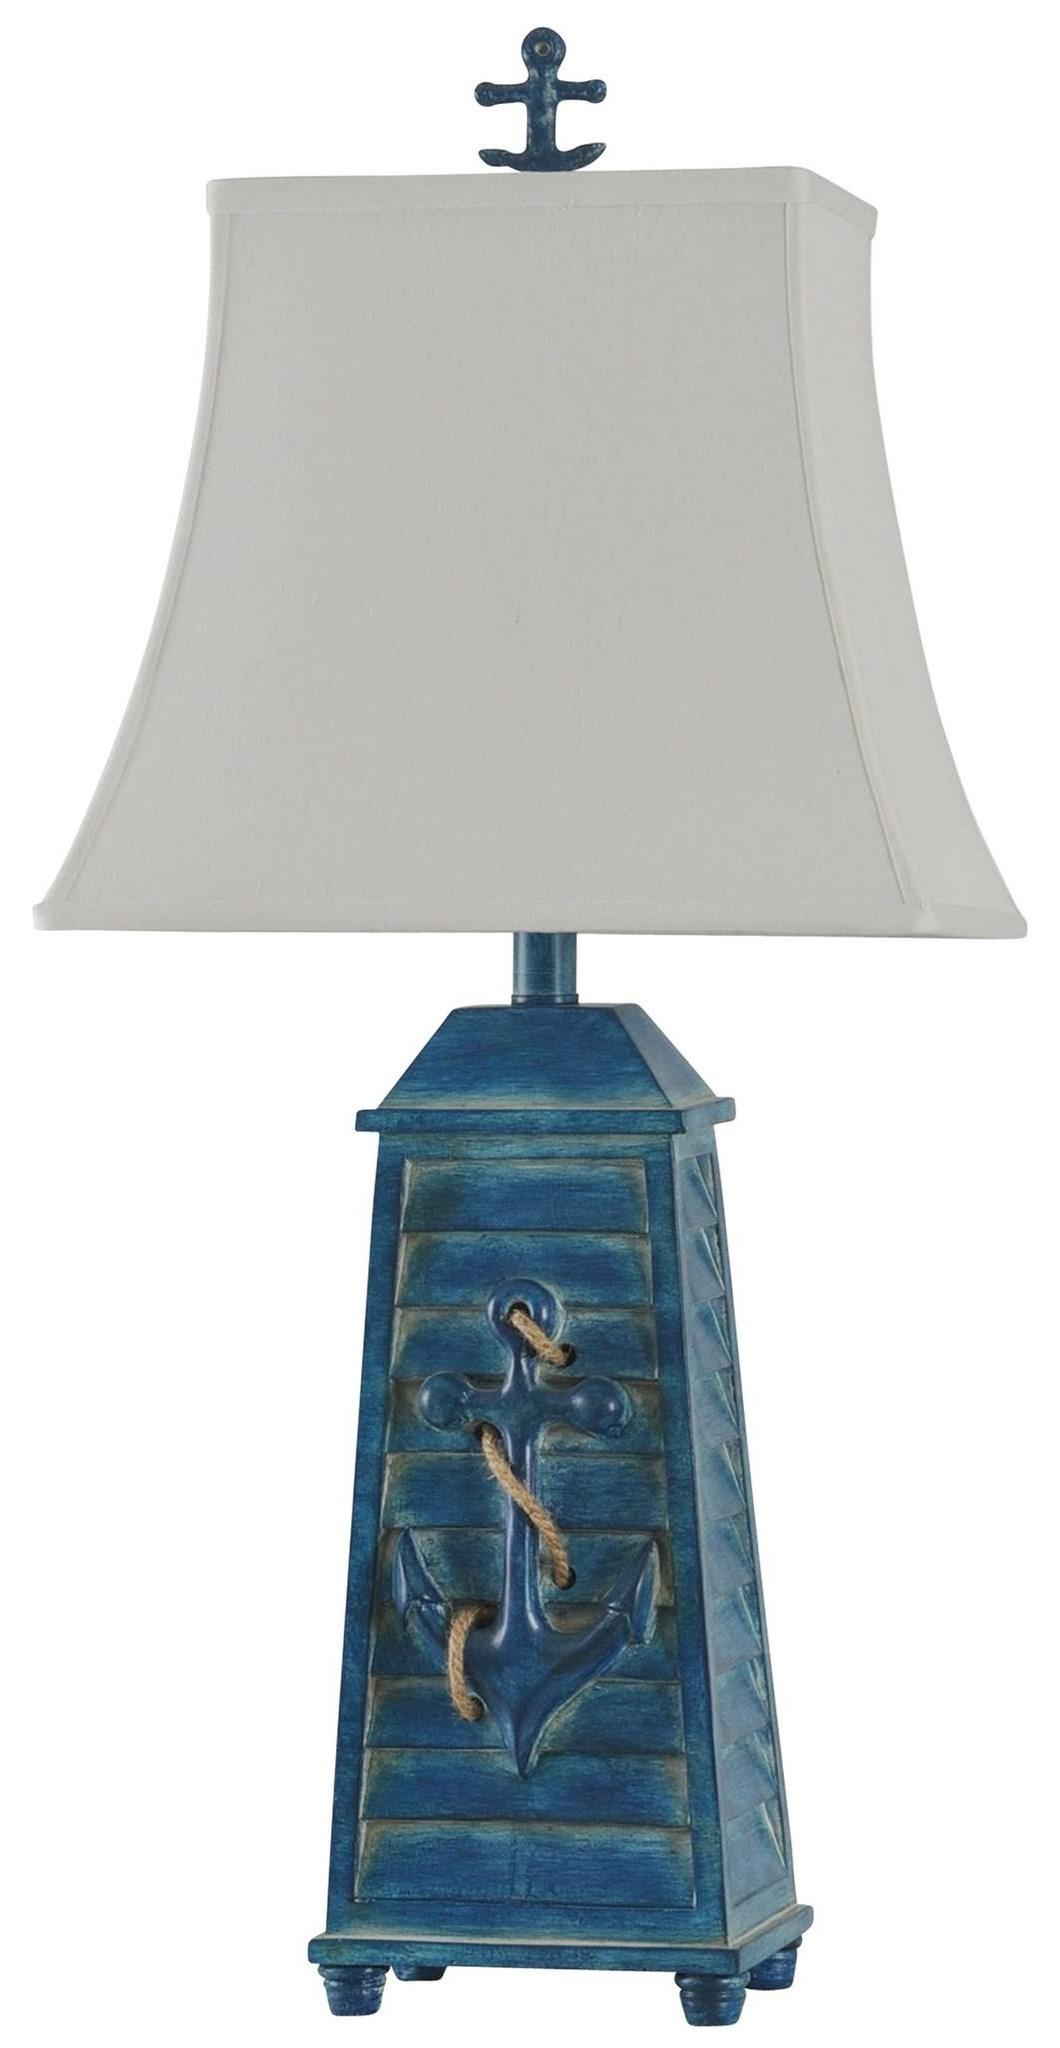 2020 LAMPS Shutter Anchor Lamp by StyleCraft at Furniture Fair - North Carolina